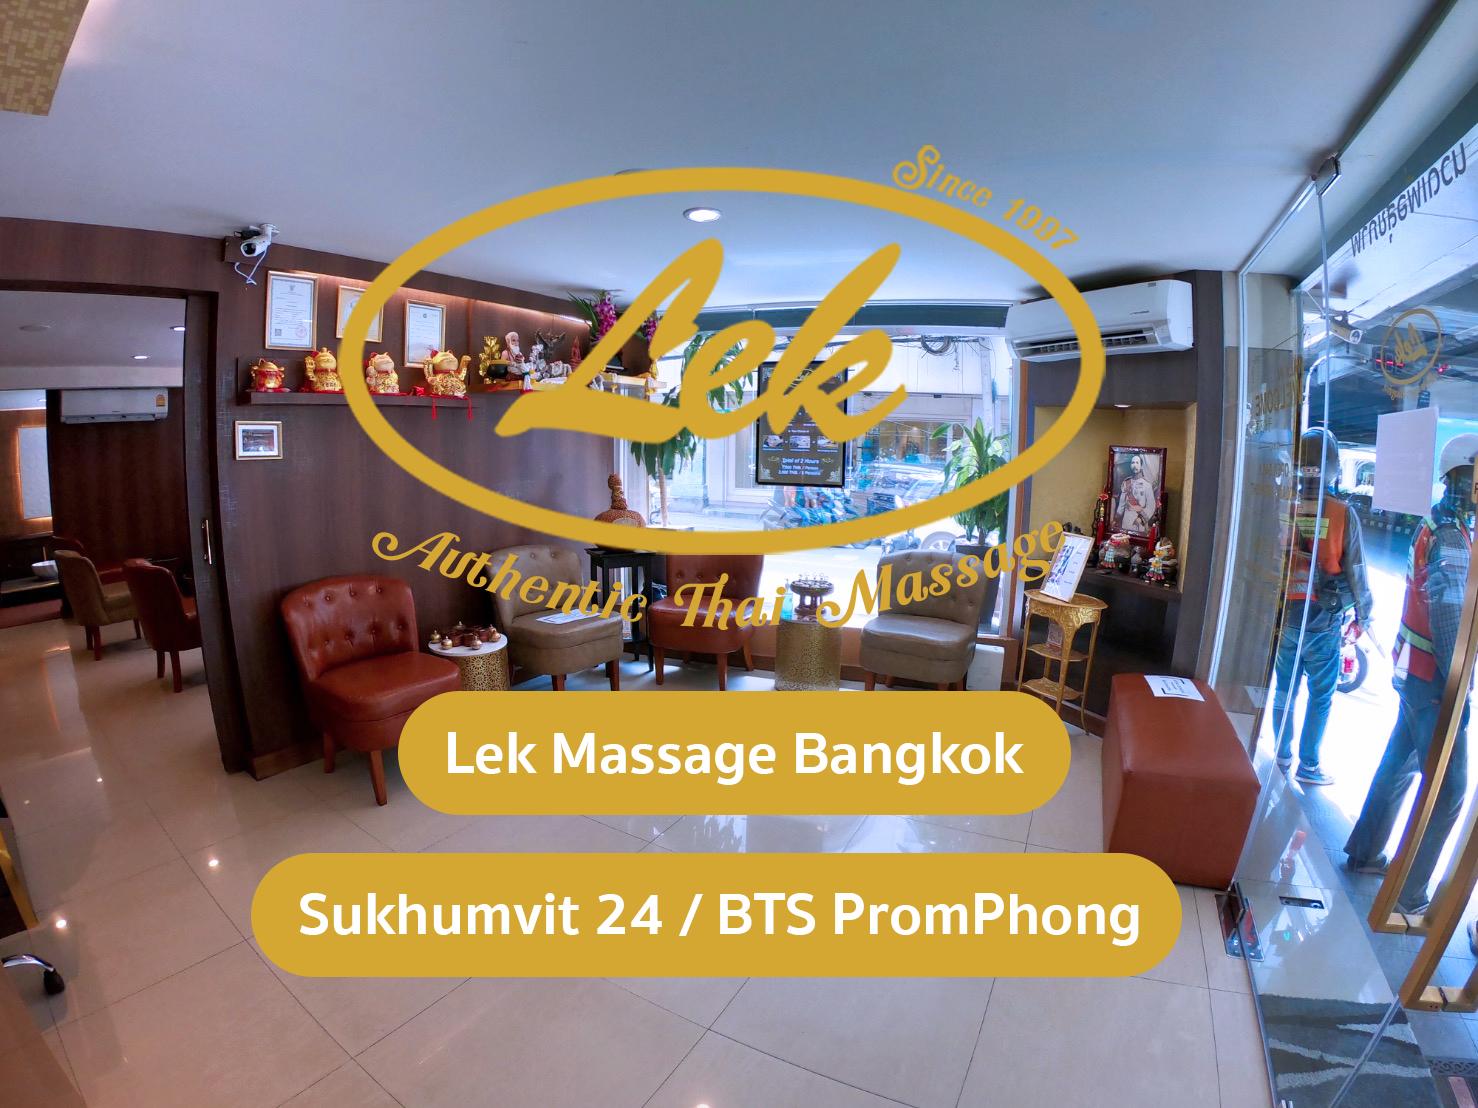 Lek Massage Bangkok